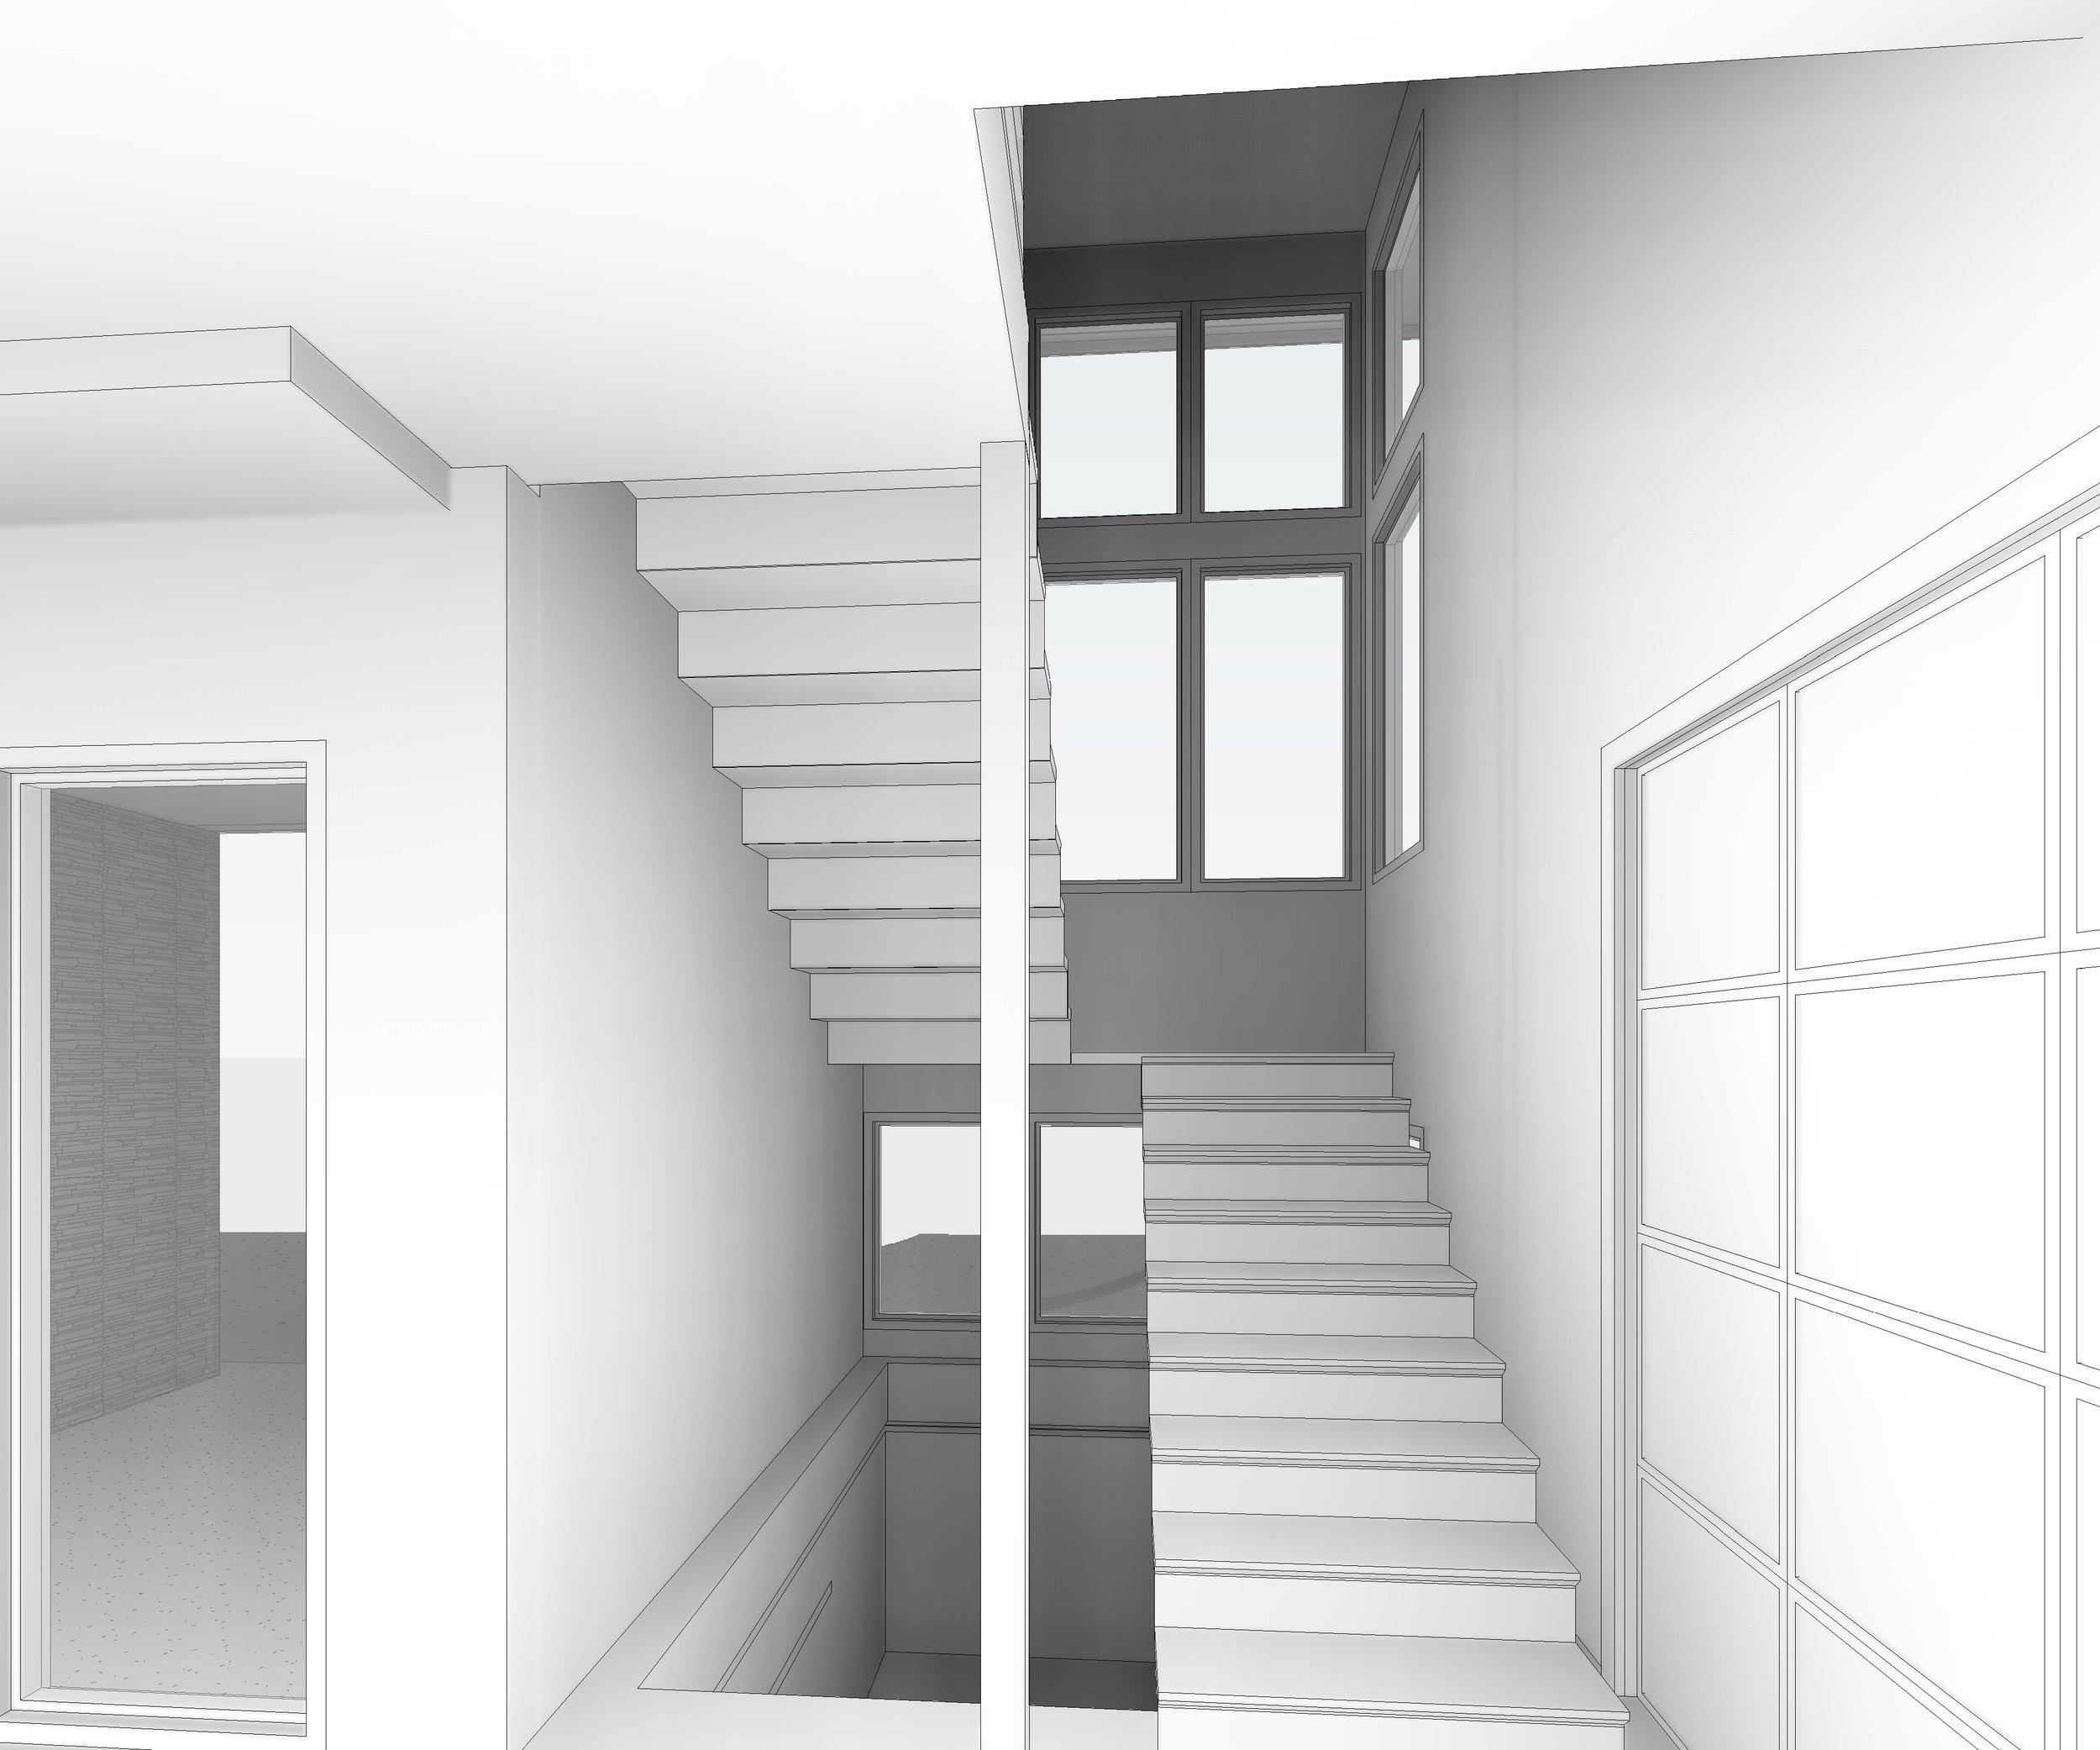 Ravulapati Residence3 - 3D View - STAIR 2.jpg